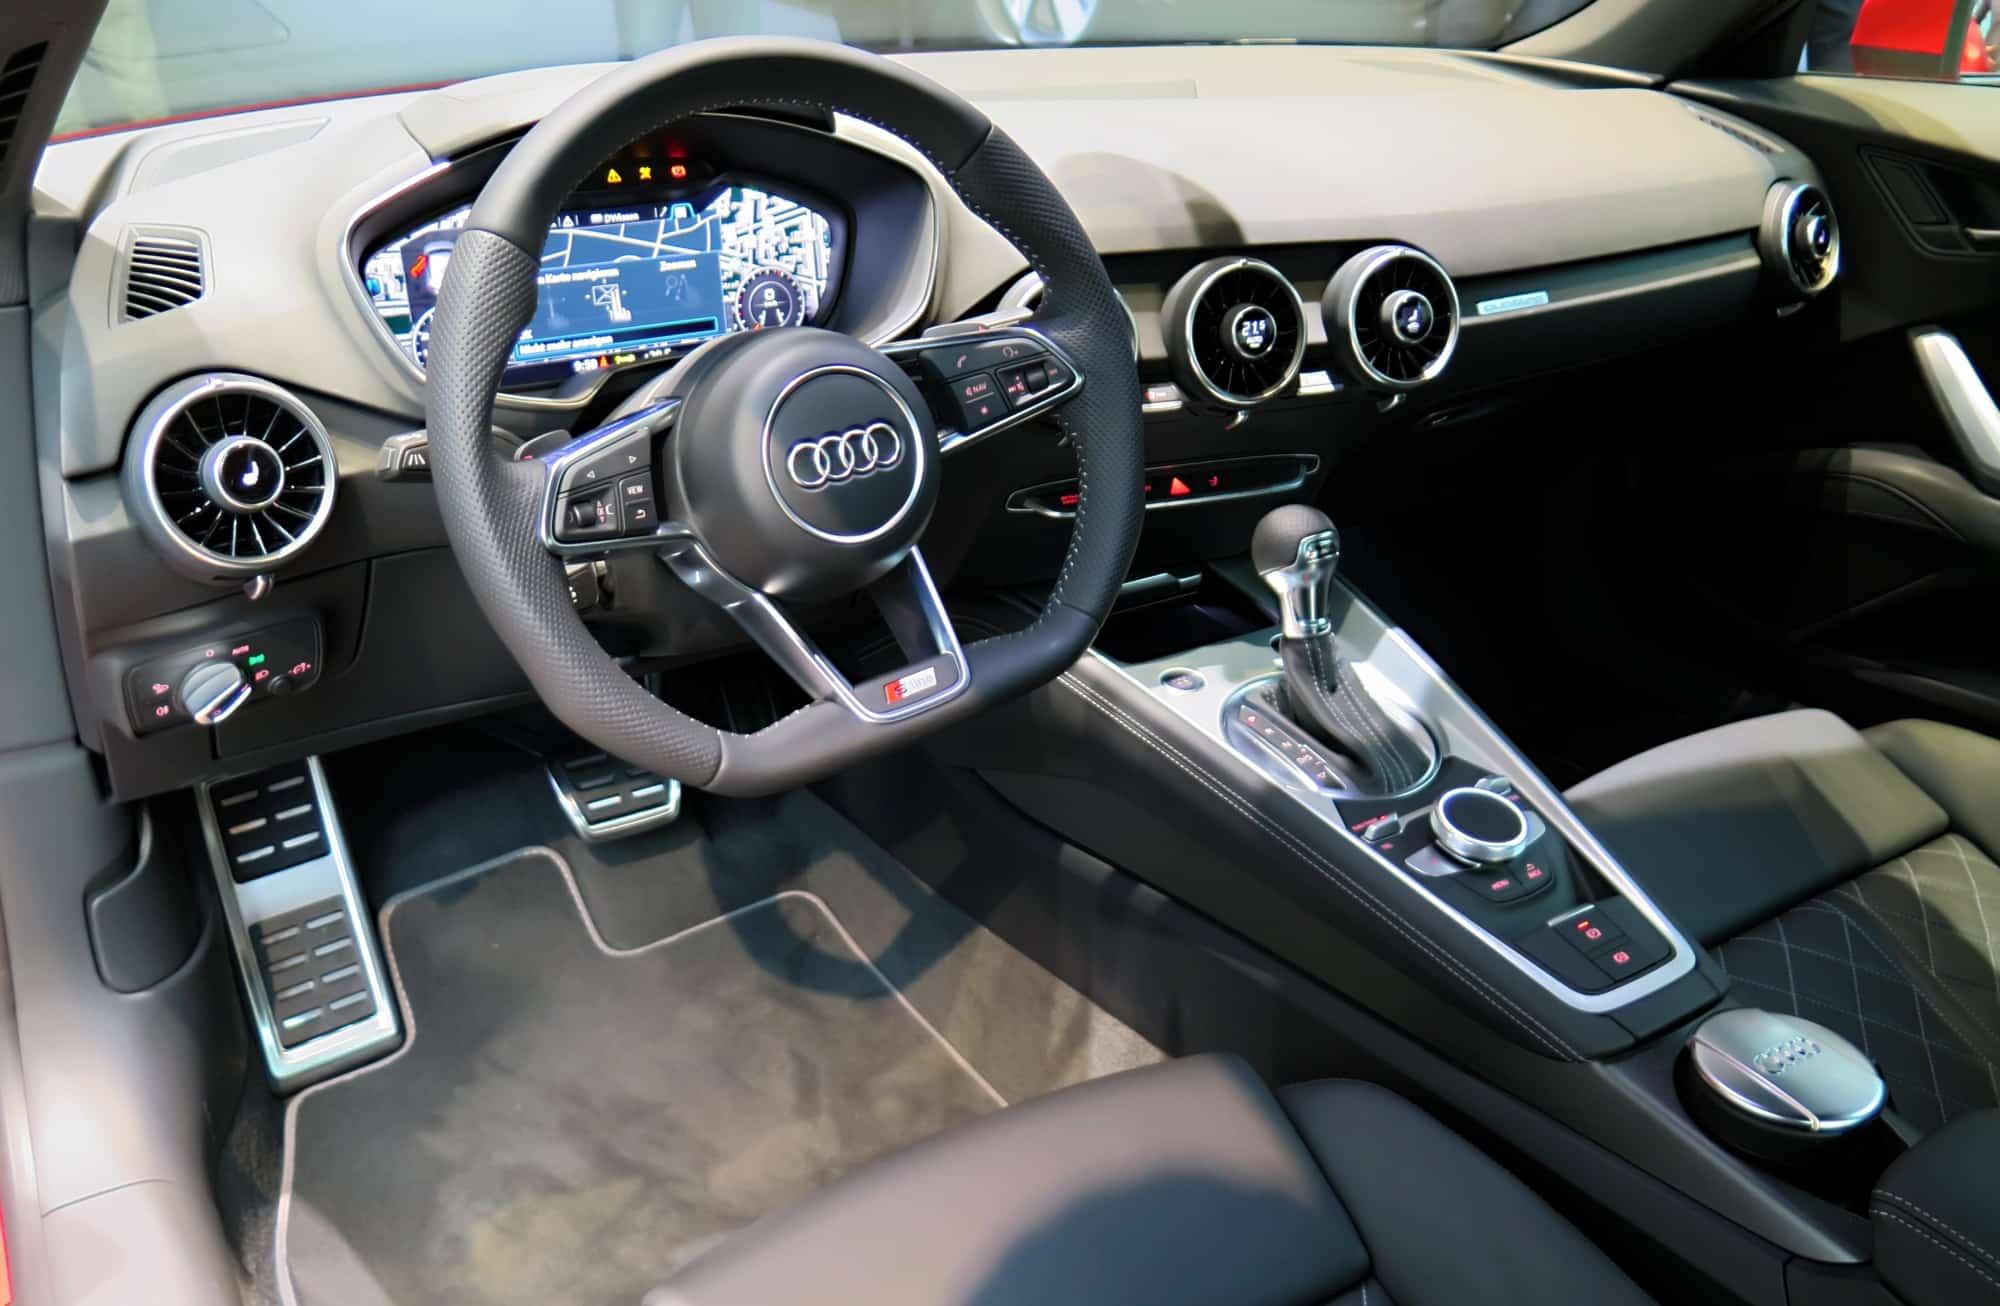 2014-Weltpremiere-Audi-TT-Coupe-2.0-TFSI-quattro-S-tronic-169-kW-Tangorot-virtual-cockpit-Interieur-Innenraum